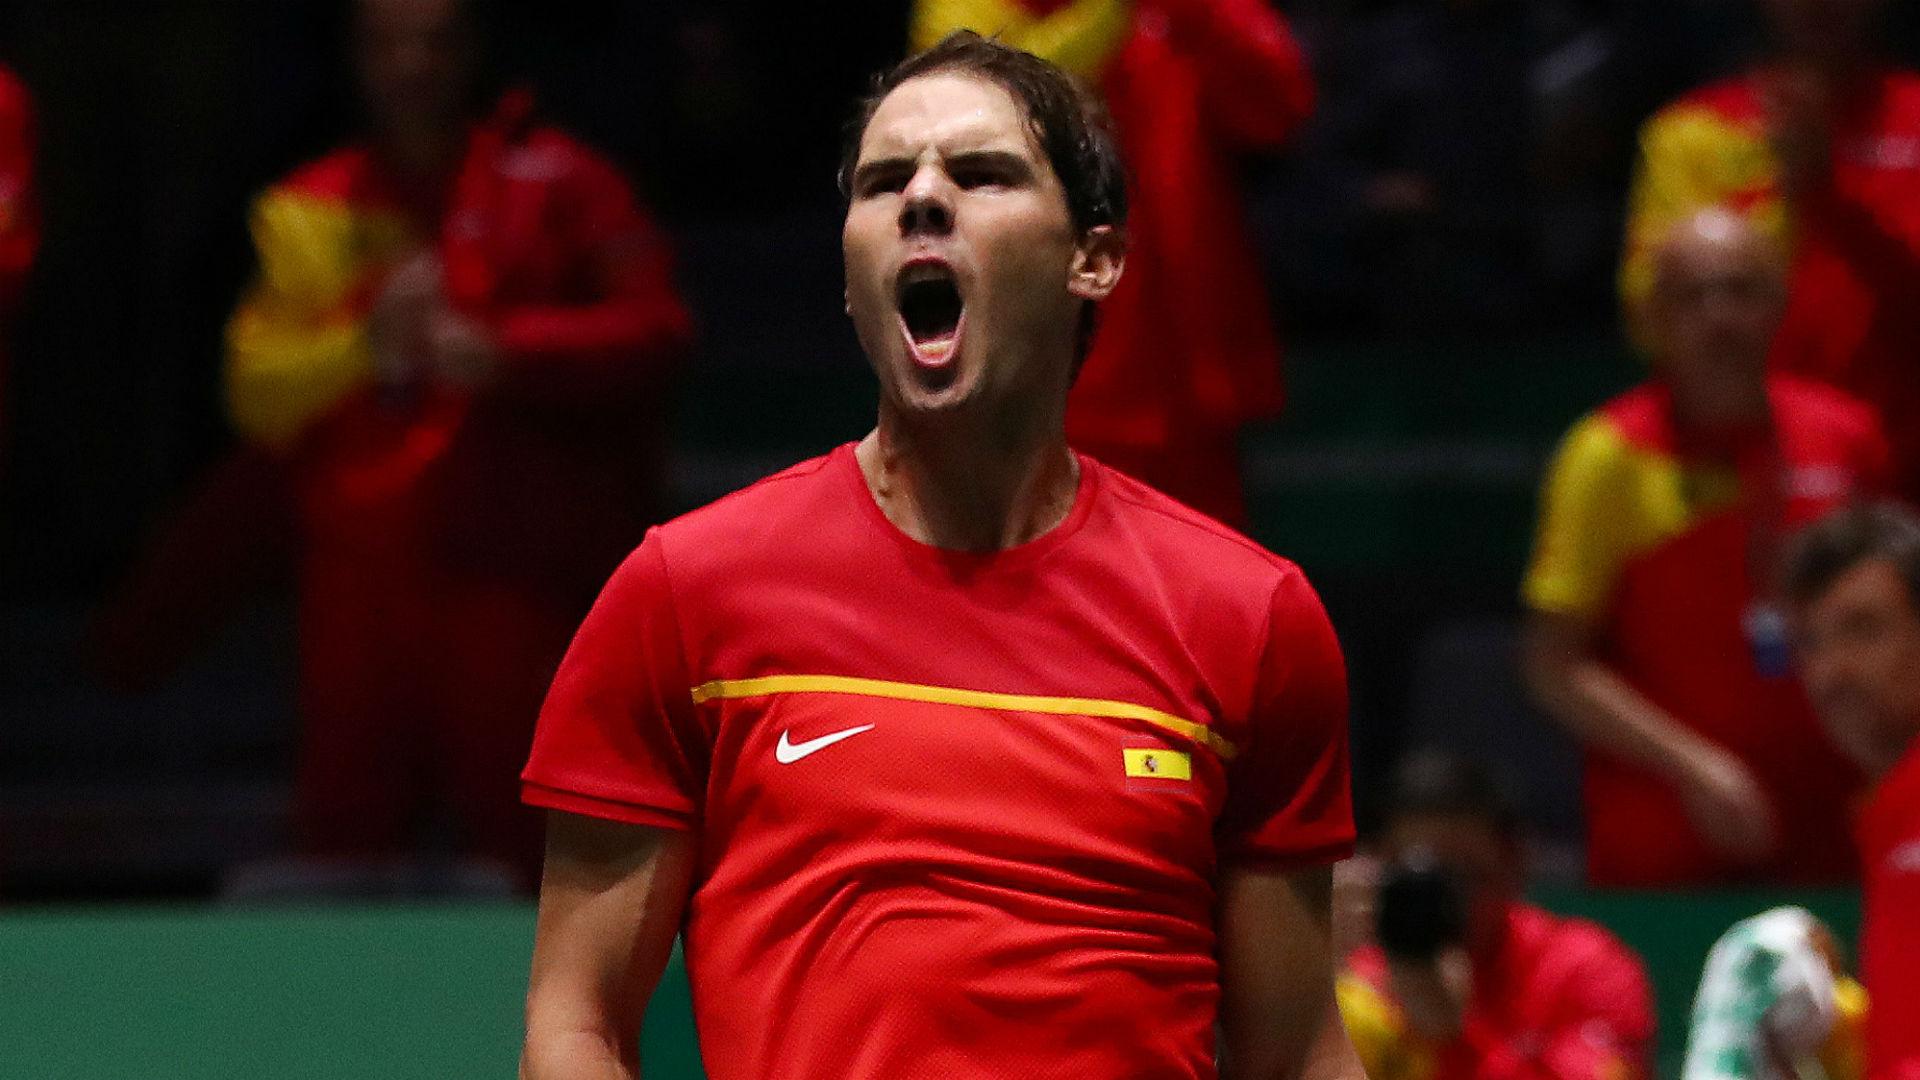 Nadal dethrones Croatia and puts Spain into last eight